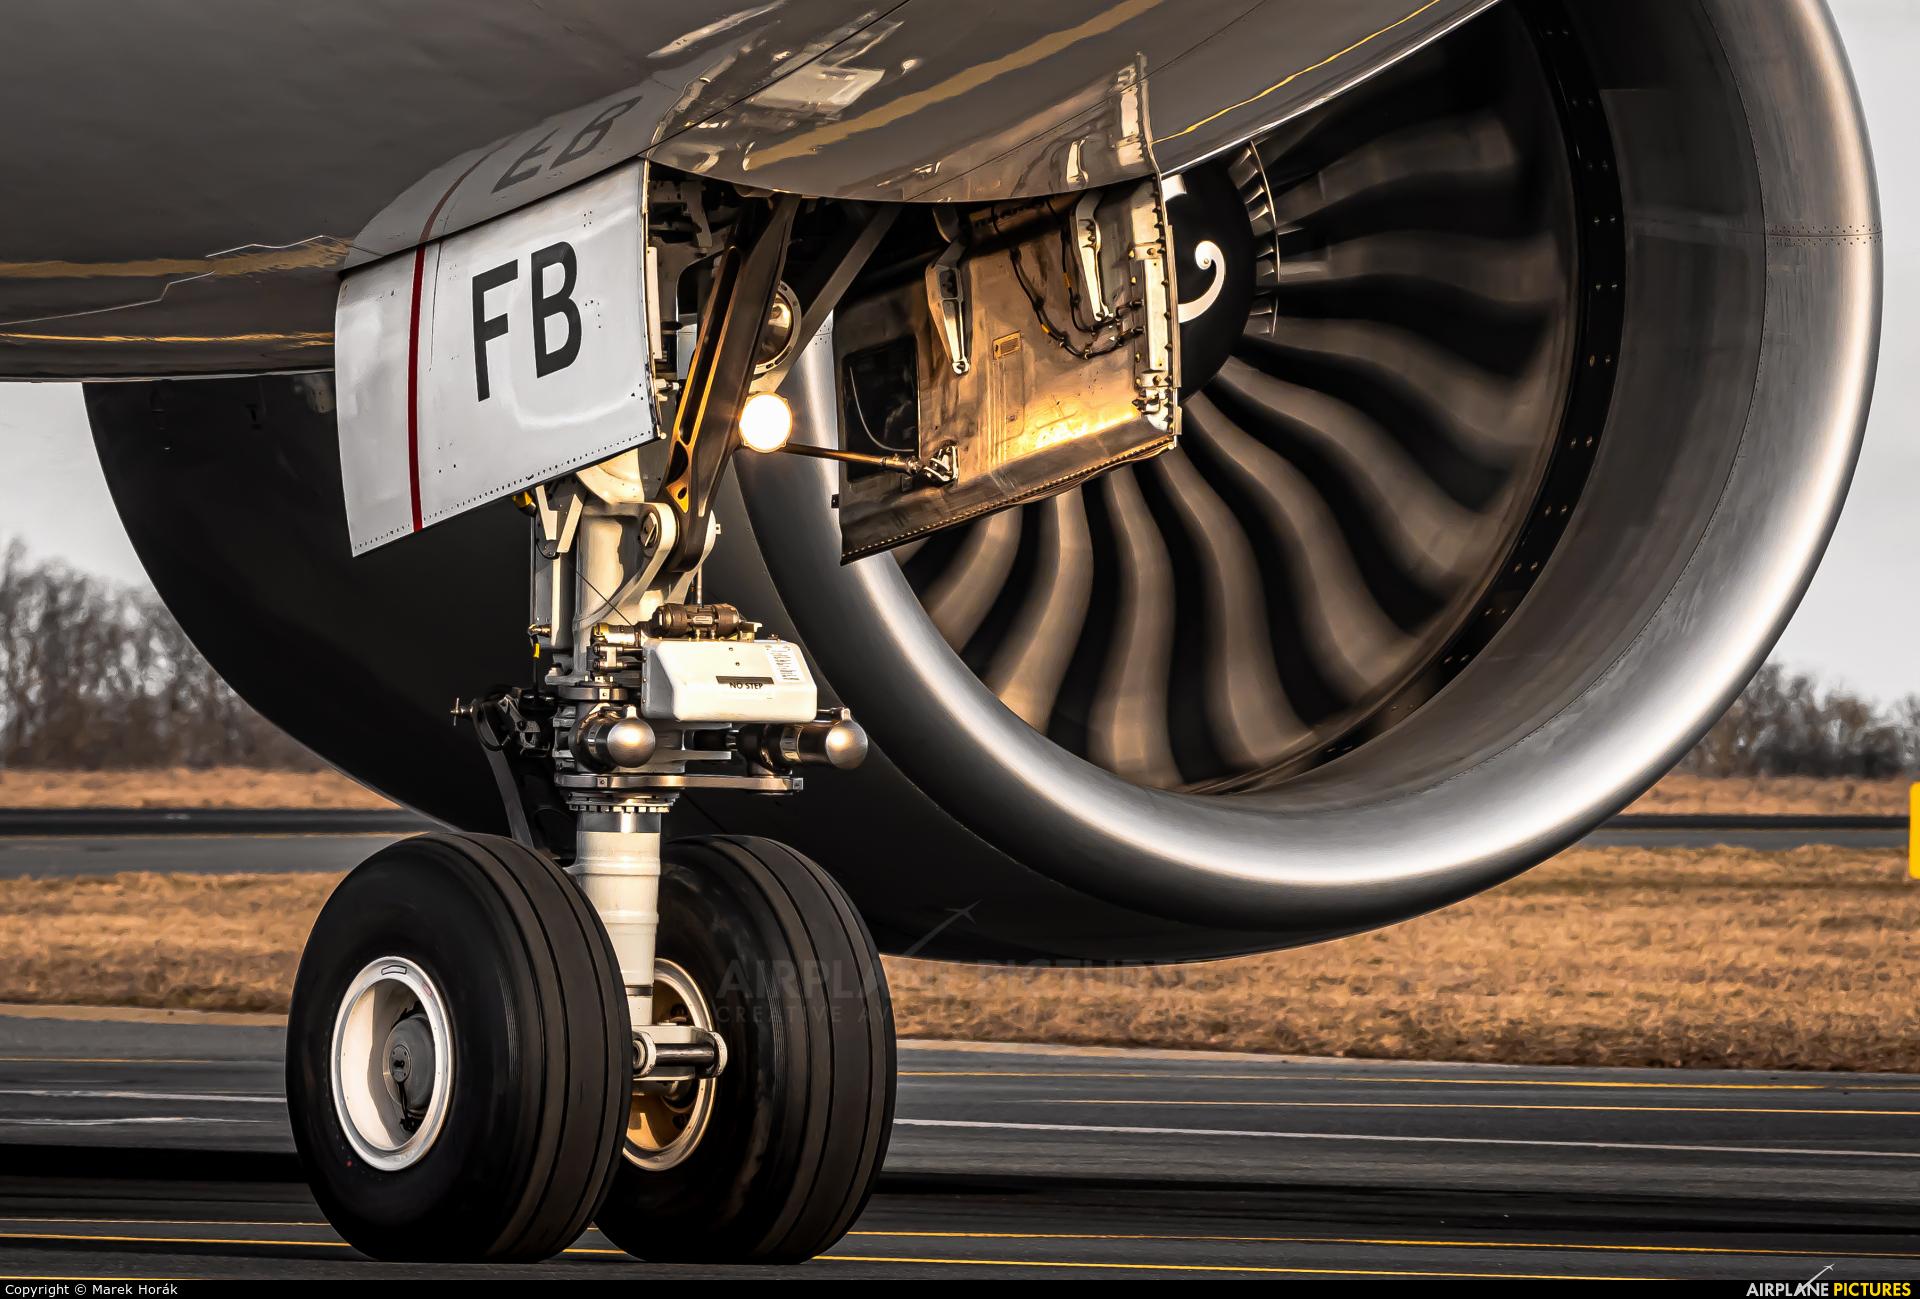 Qatar Airways Cargo A7-BFB aircraft at Prague - Václav Havel